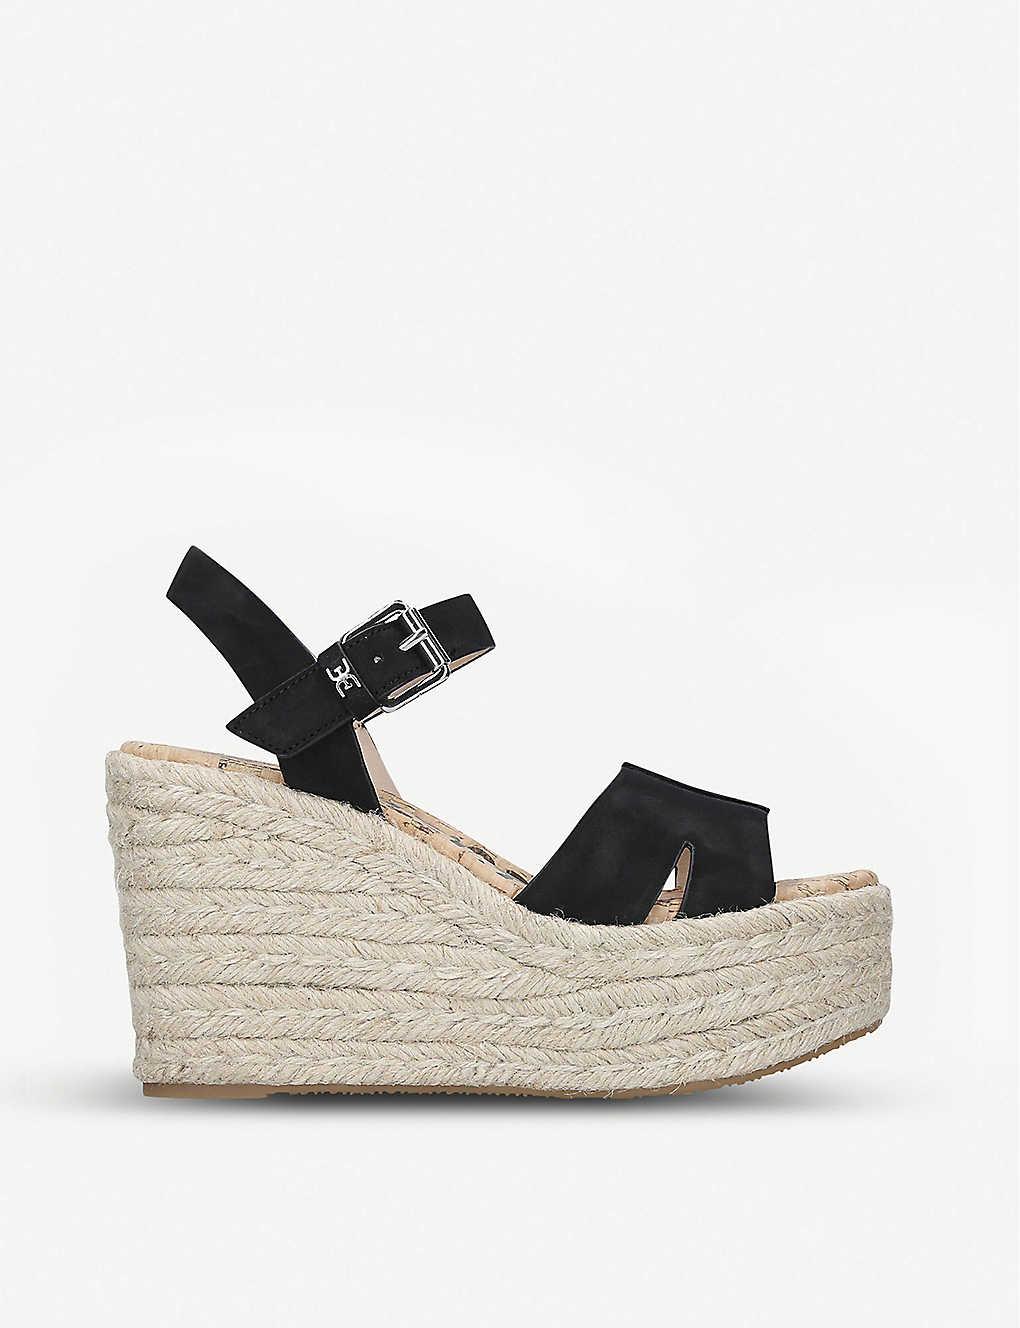 b57a36de29a Maura leather espadrille wedge sandals